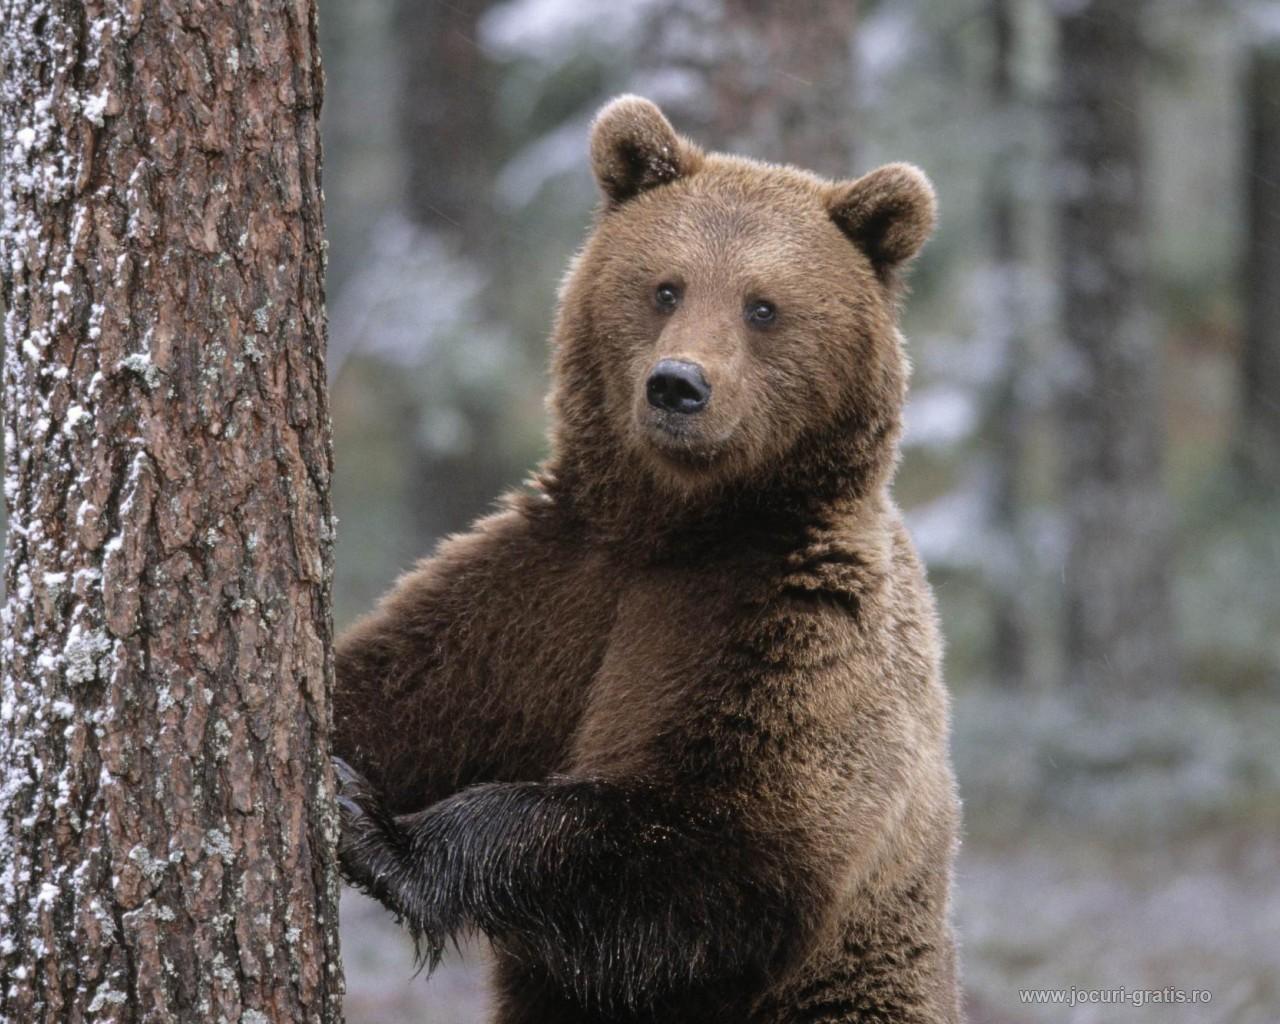 Why visit Romania?: Brown bear